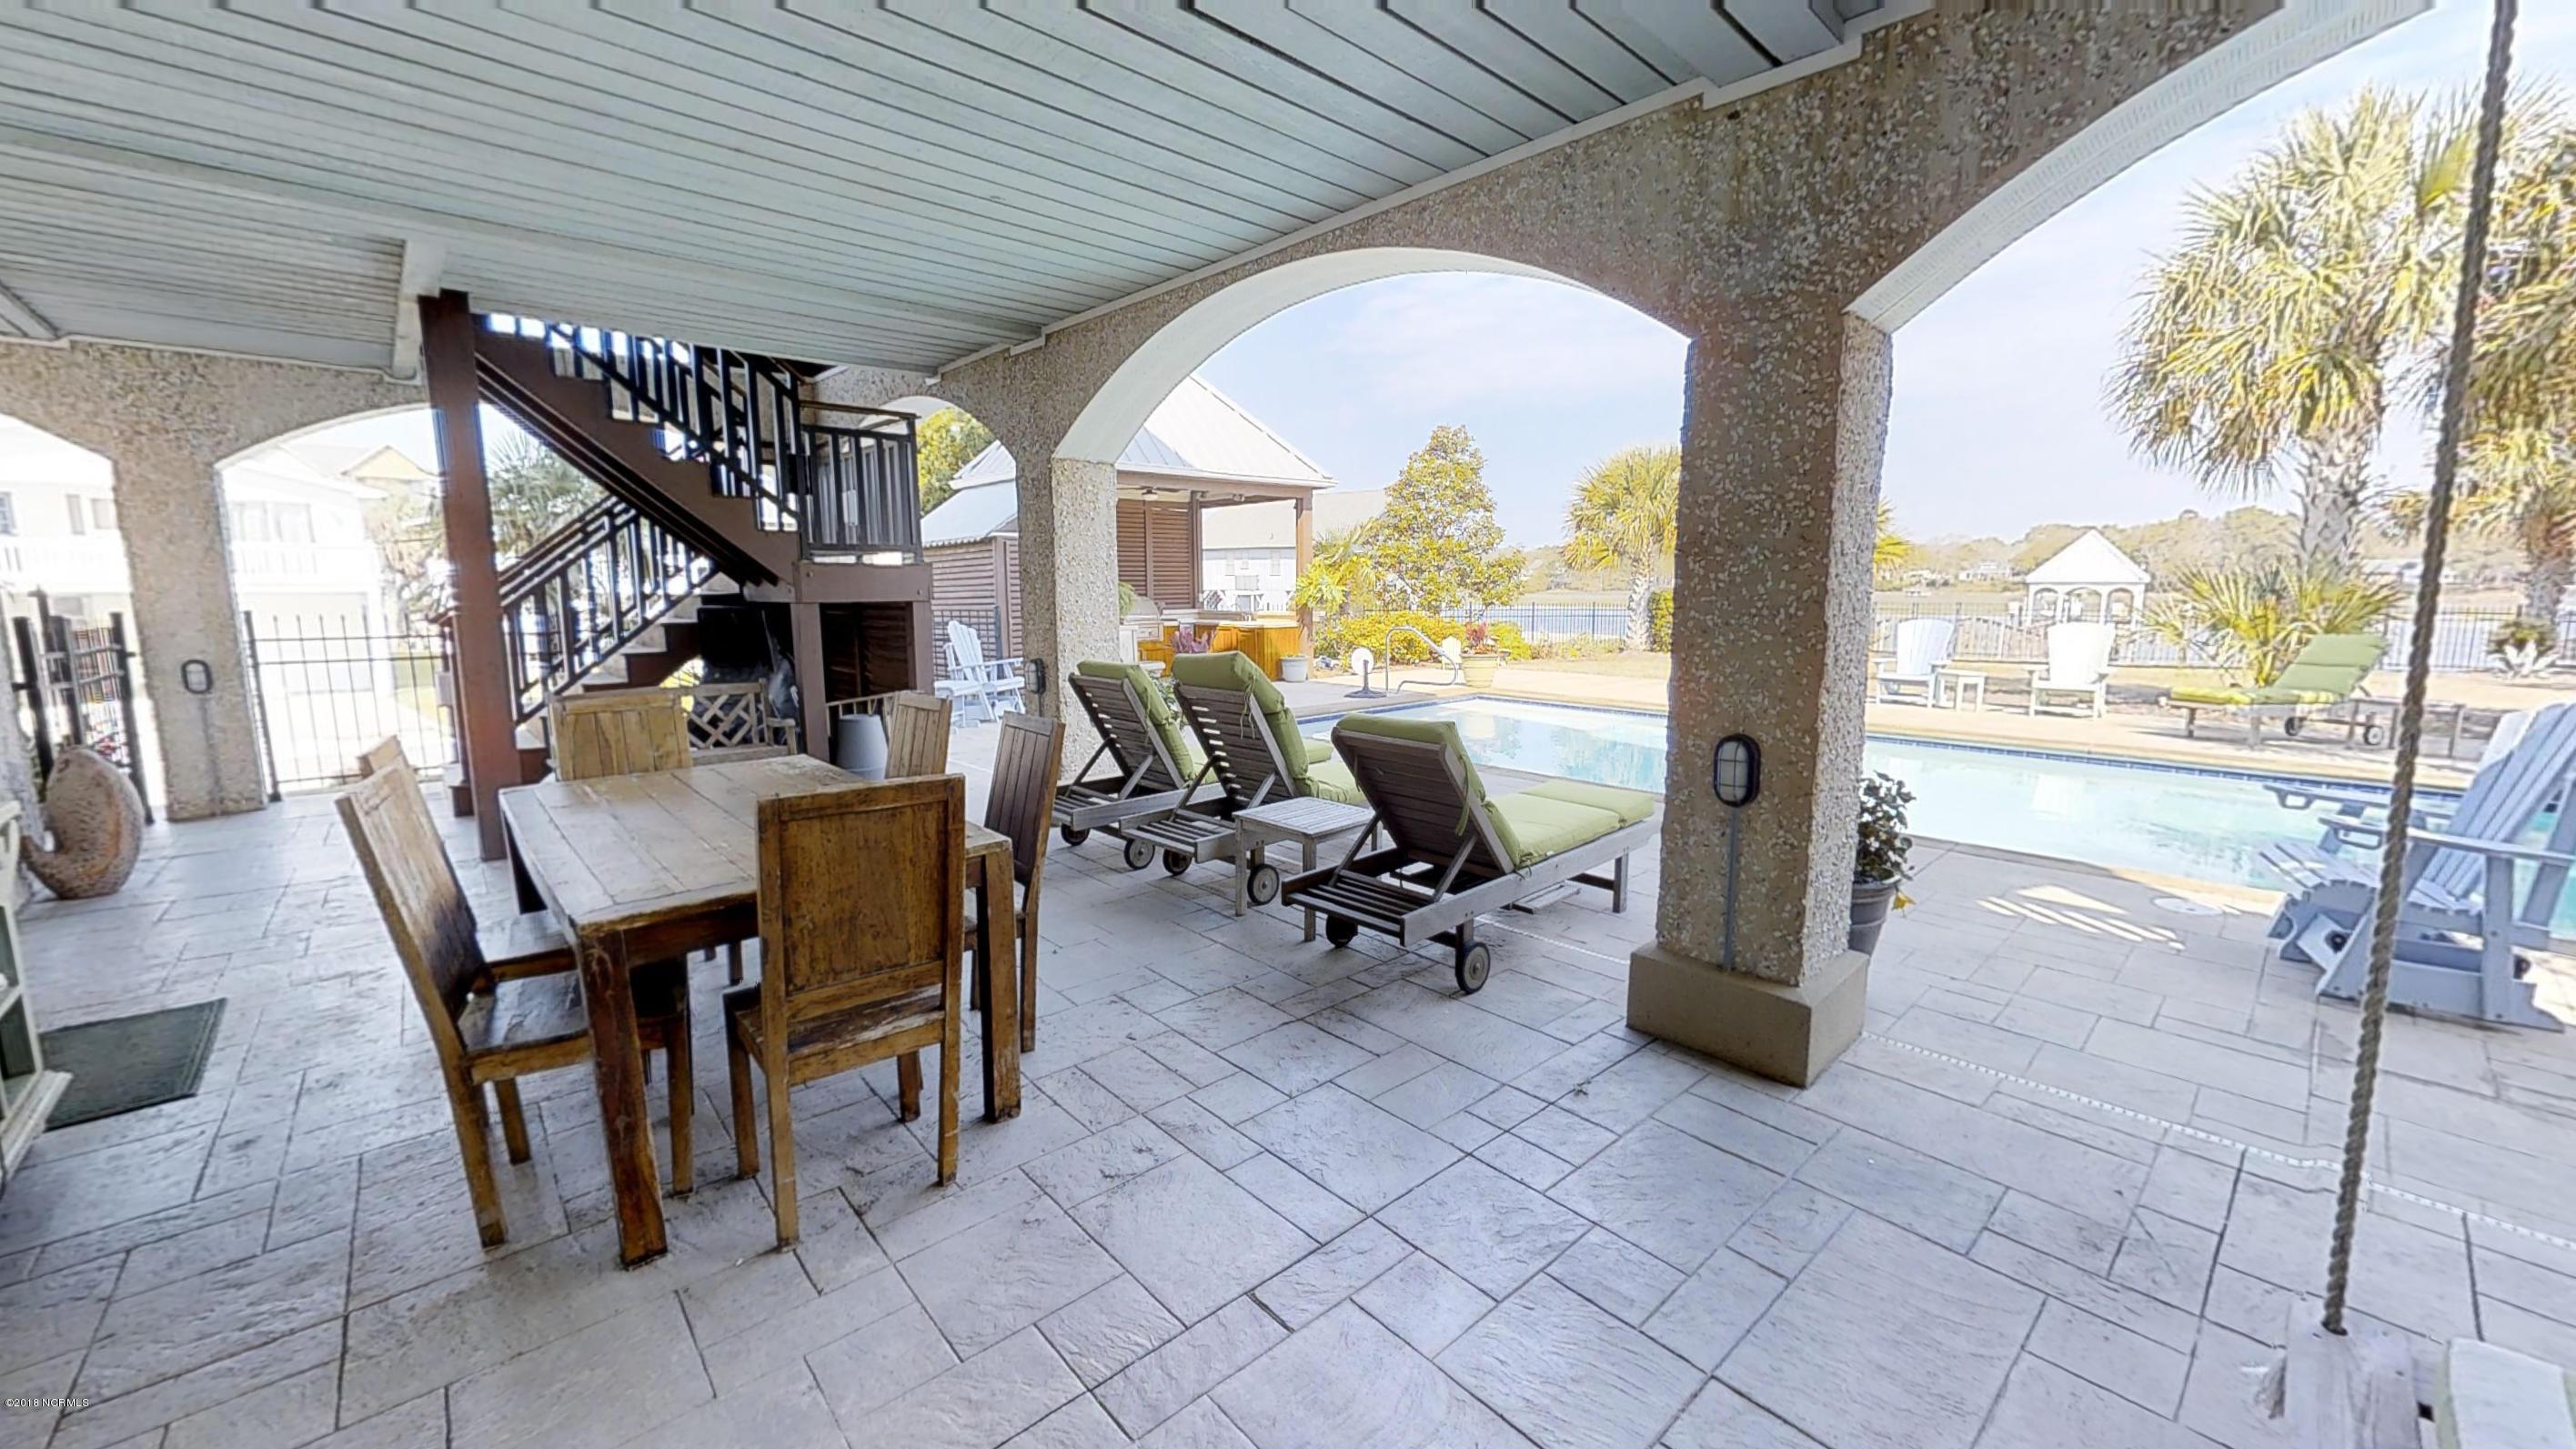 Ocean Isle Beach Real Estate - http://cdn.resize.sparkplatform.com/ncr/1024x768/true/20180414120402799364000000-o.jpg